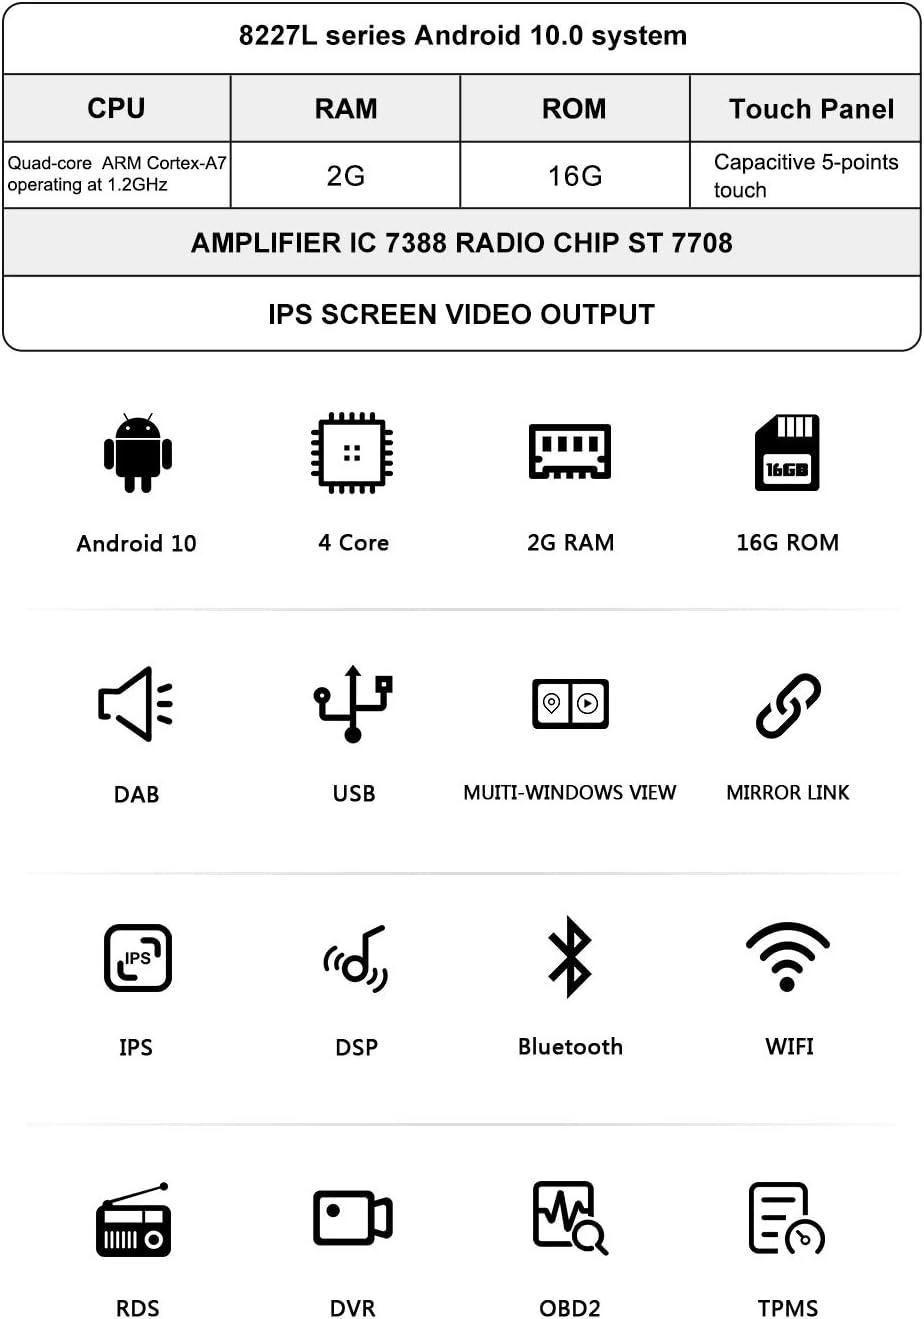 BOOYES para Mercedes-Benz W169 W245 B160 B170 B180 B200 W639 Vito Viano W906 Sprinter VW Crafter Android 10.0 Radio para auto Est/éreo GPS 9 Reproductor multimedia para auto Reproducci/ón autom/ática